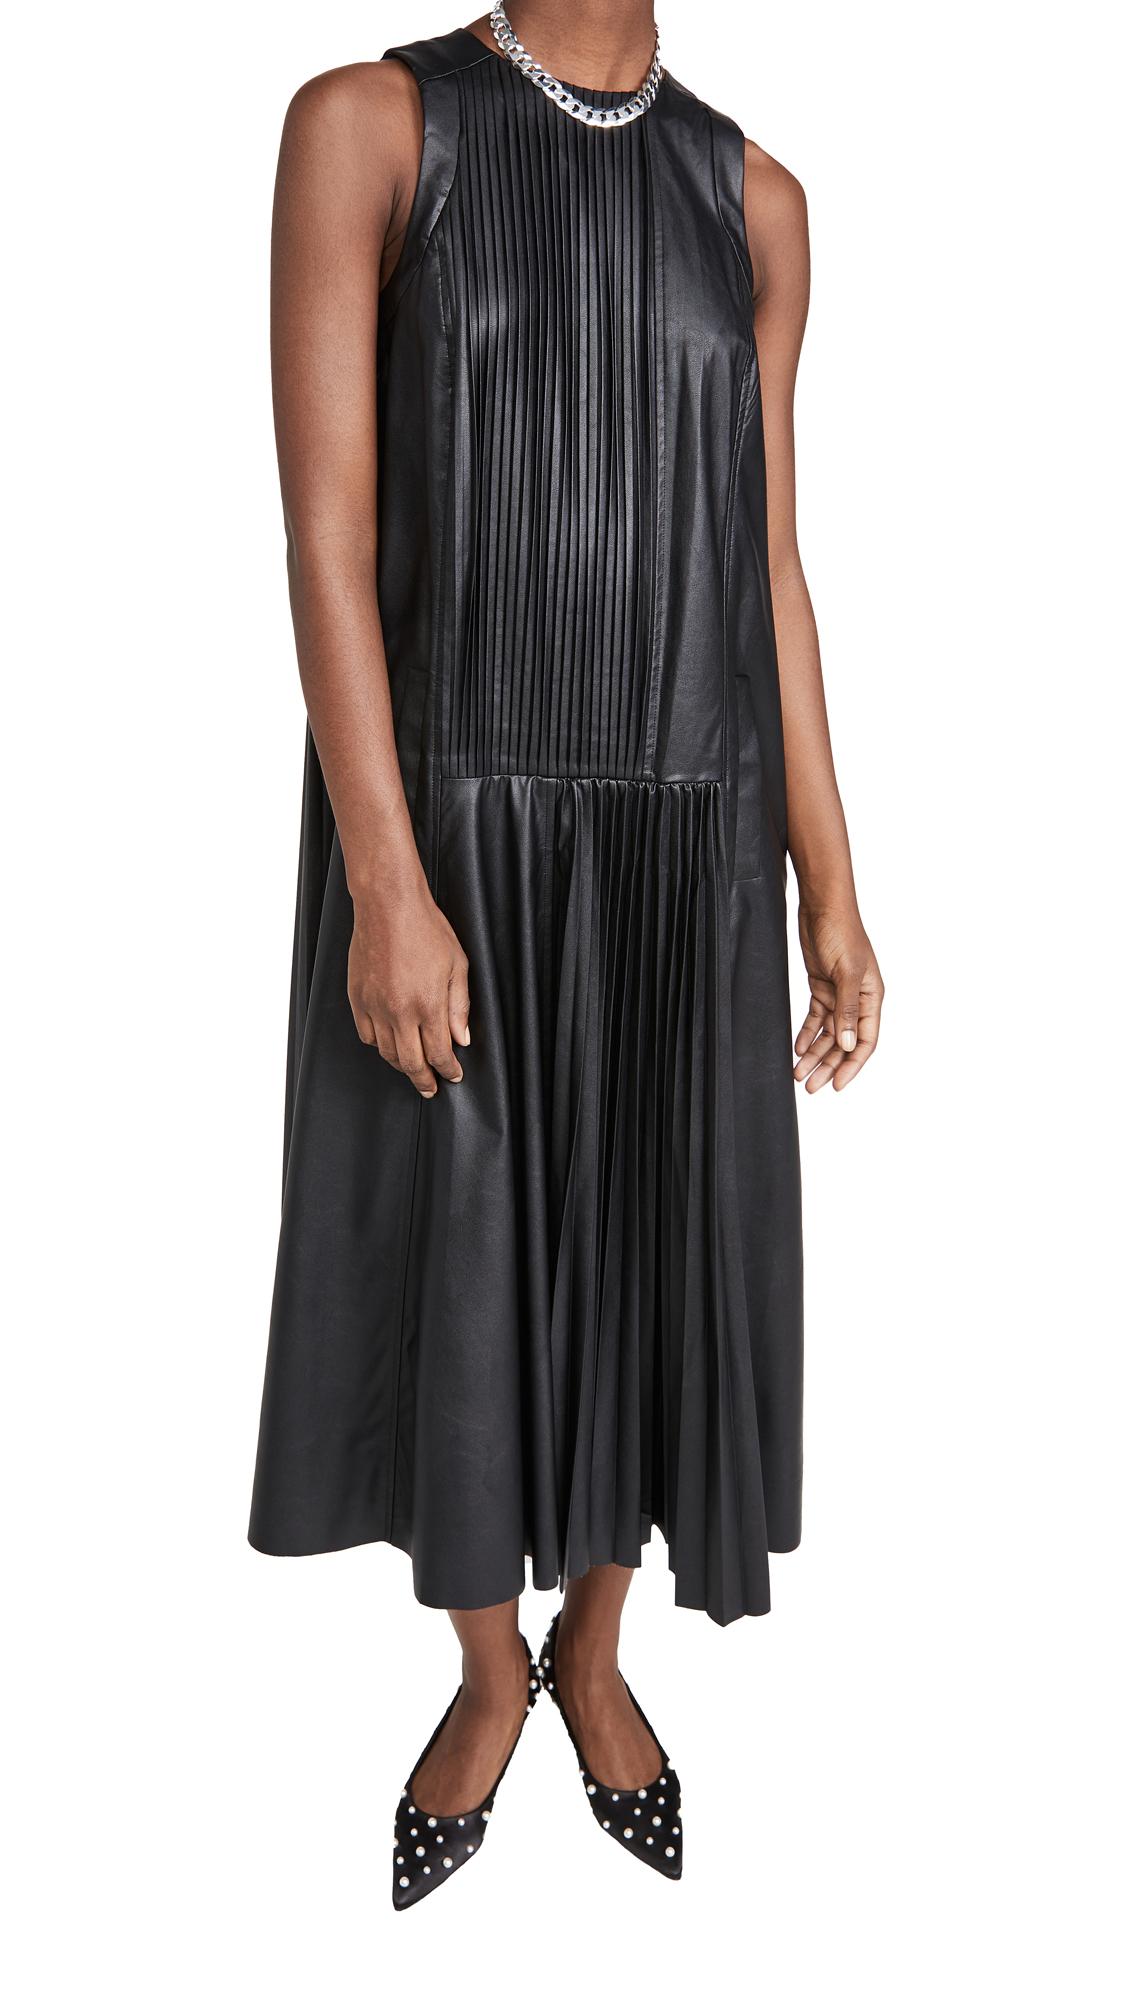 Tibi Faux Leather Dress